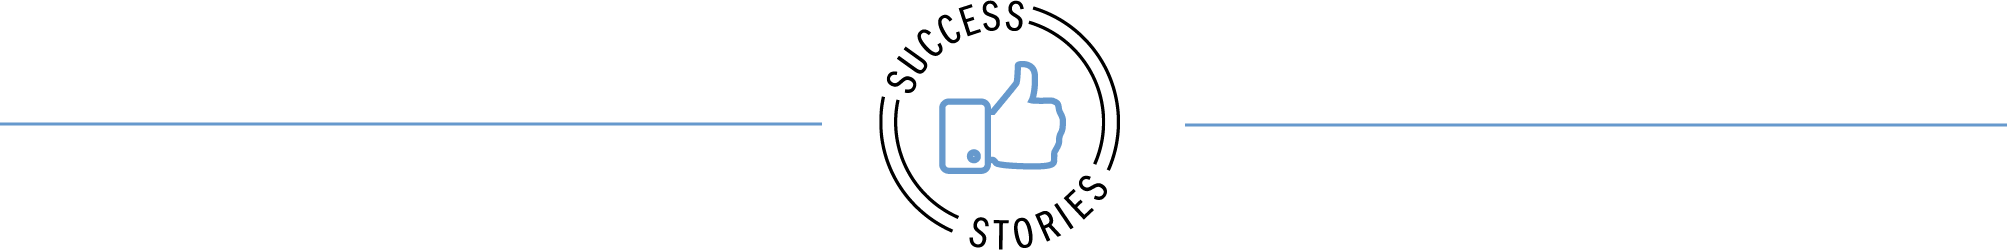 Success Stories Divider